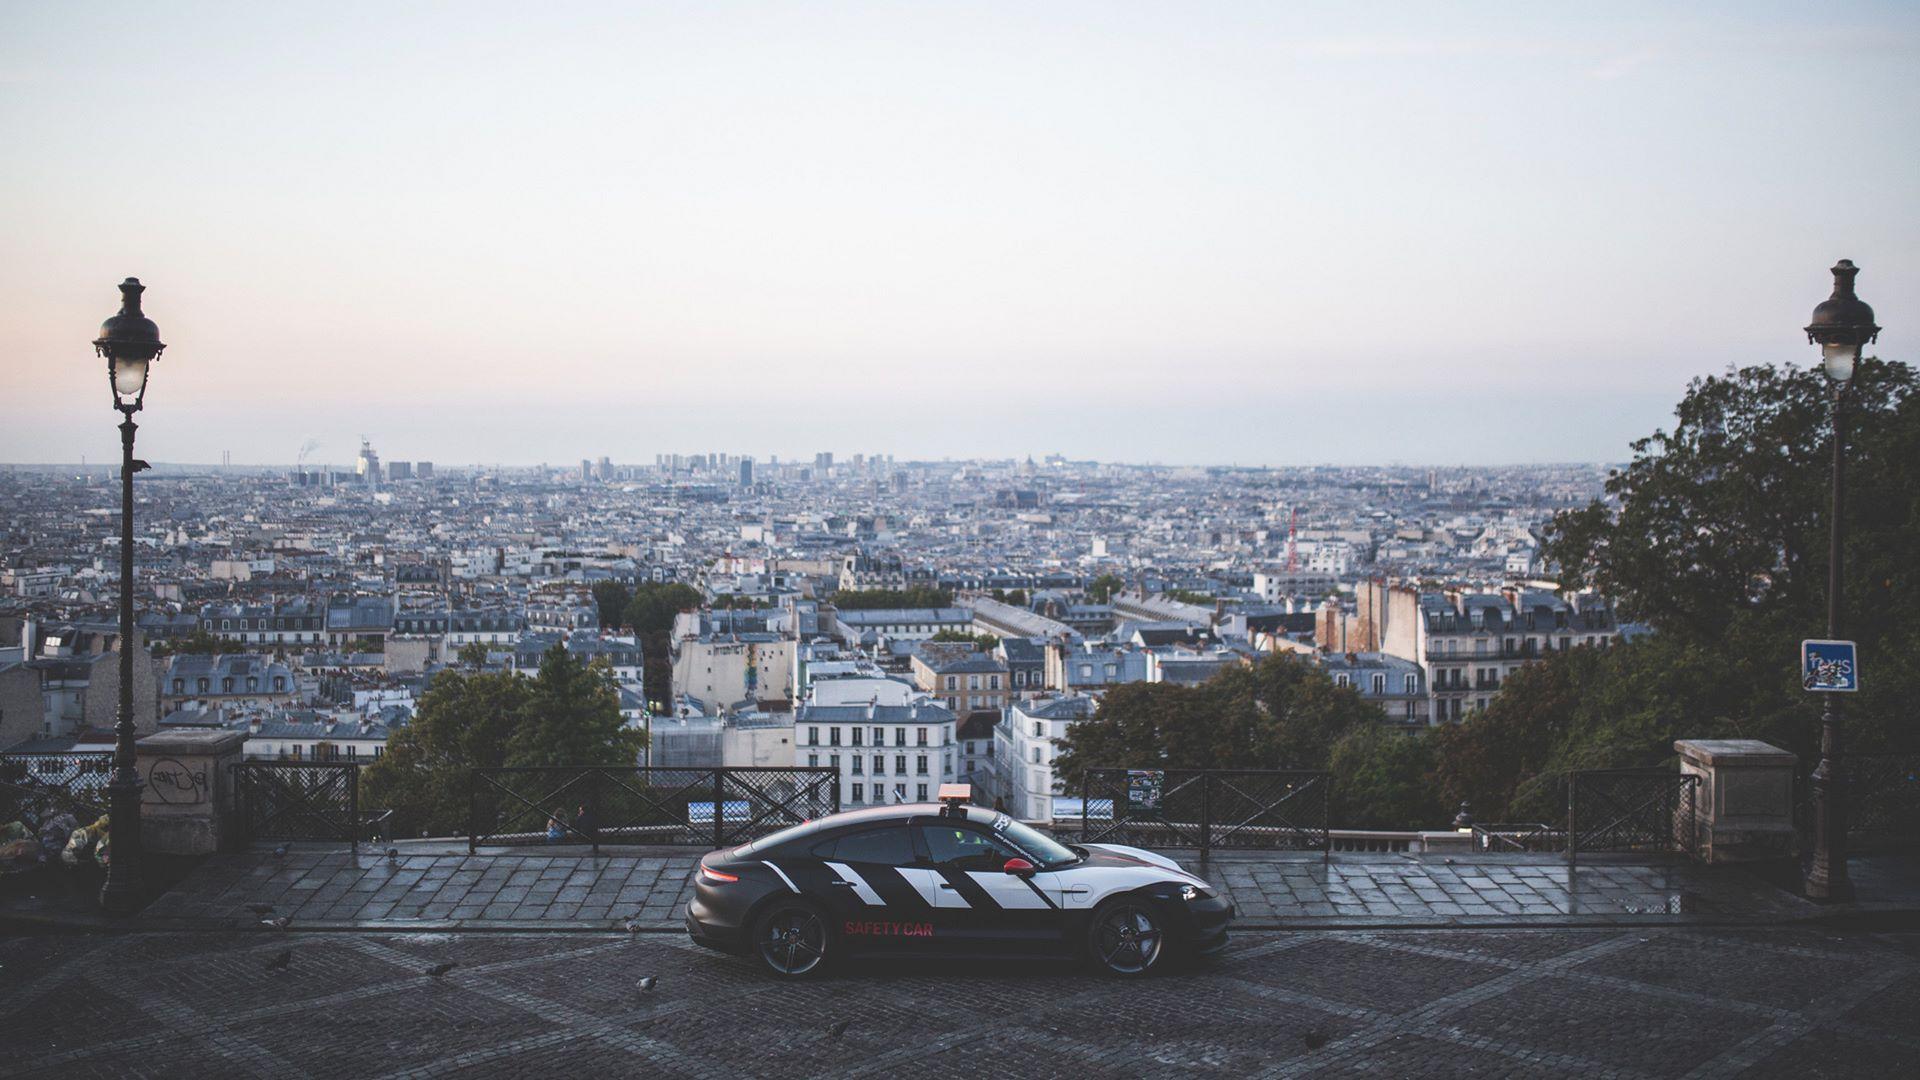 Porsche-Taycan-Turbo-safety-car-Le-Mans-2020-16